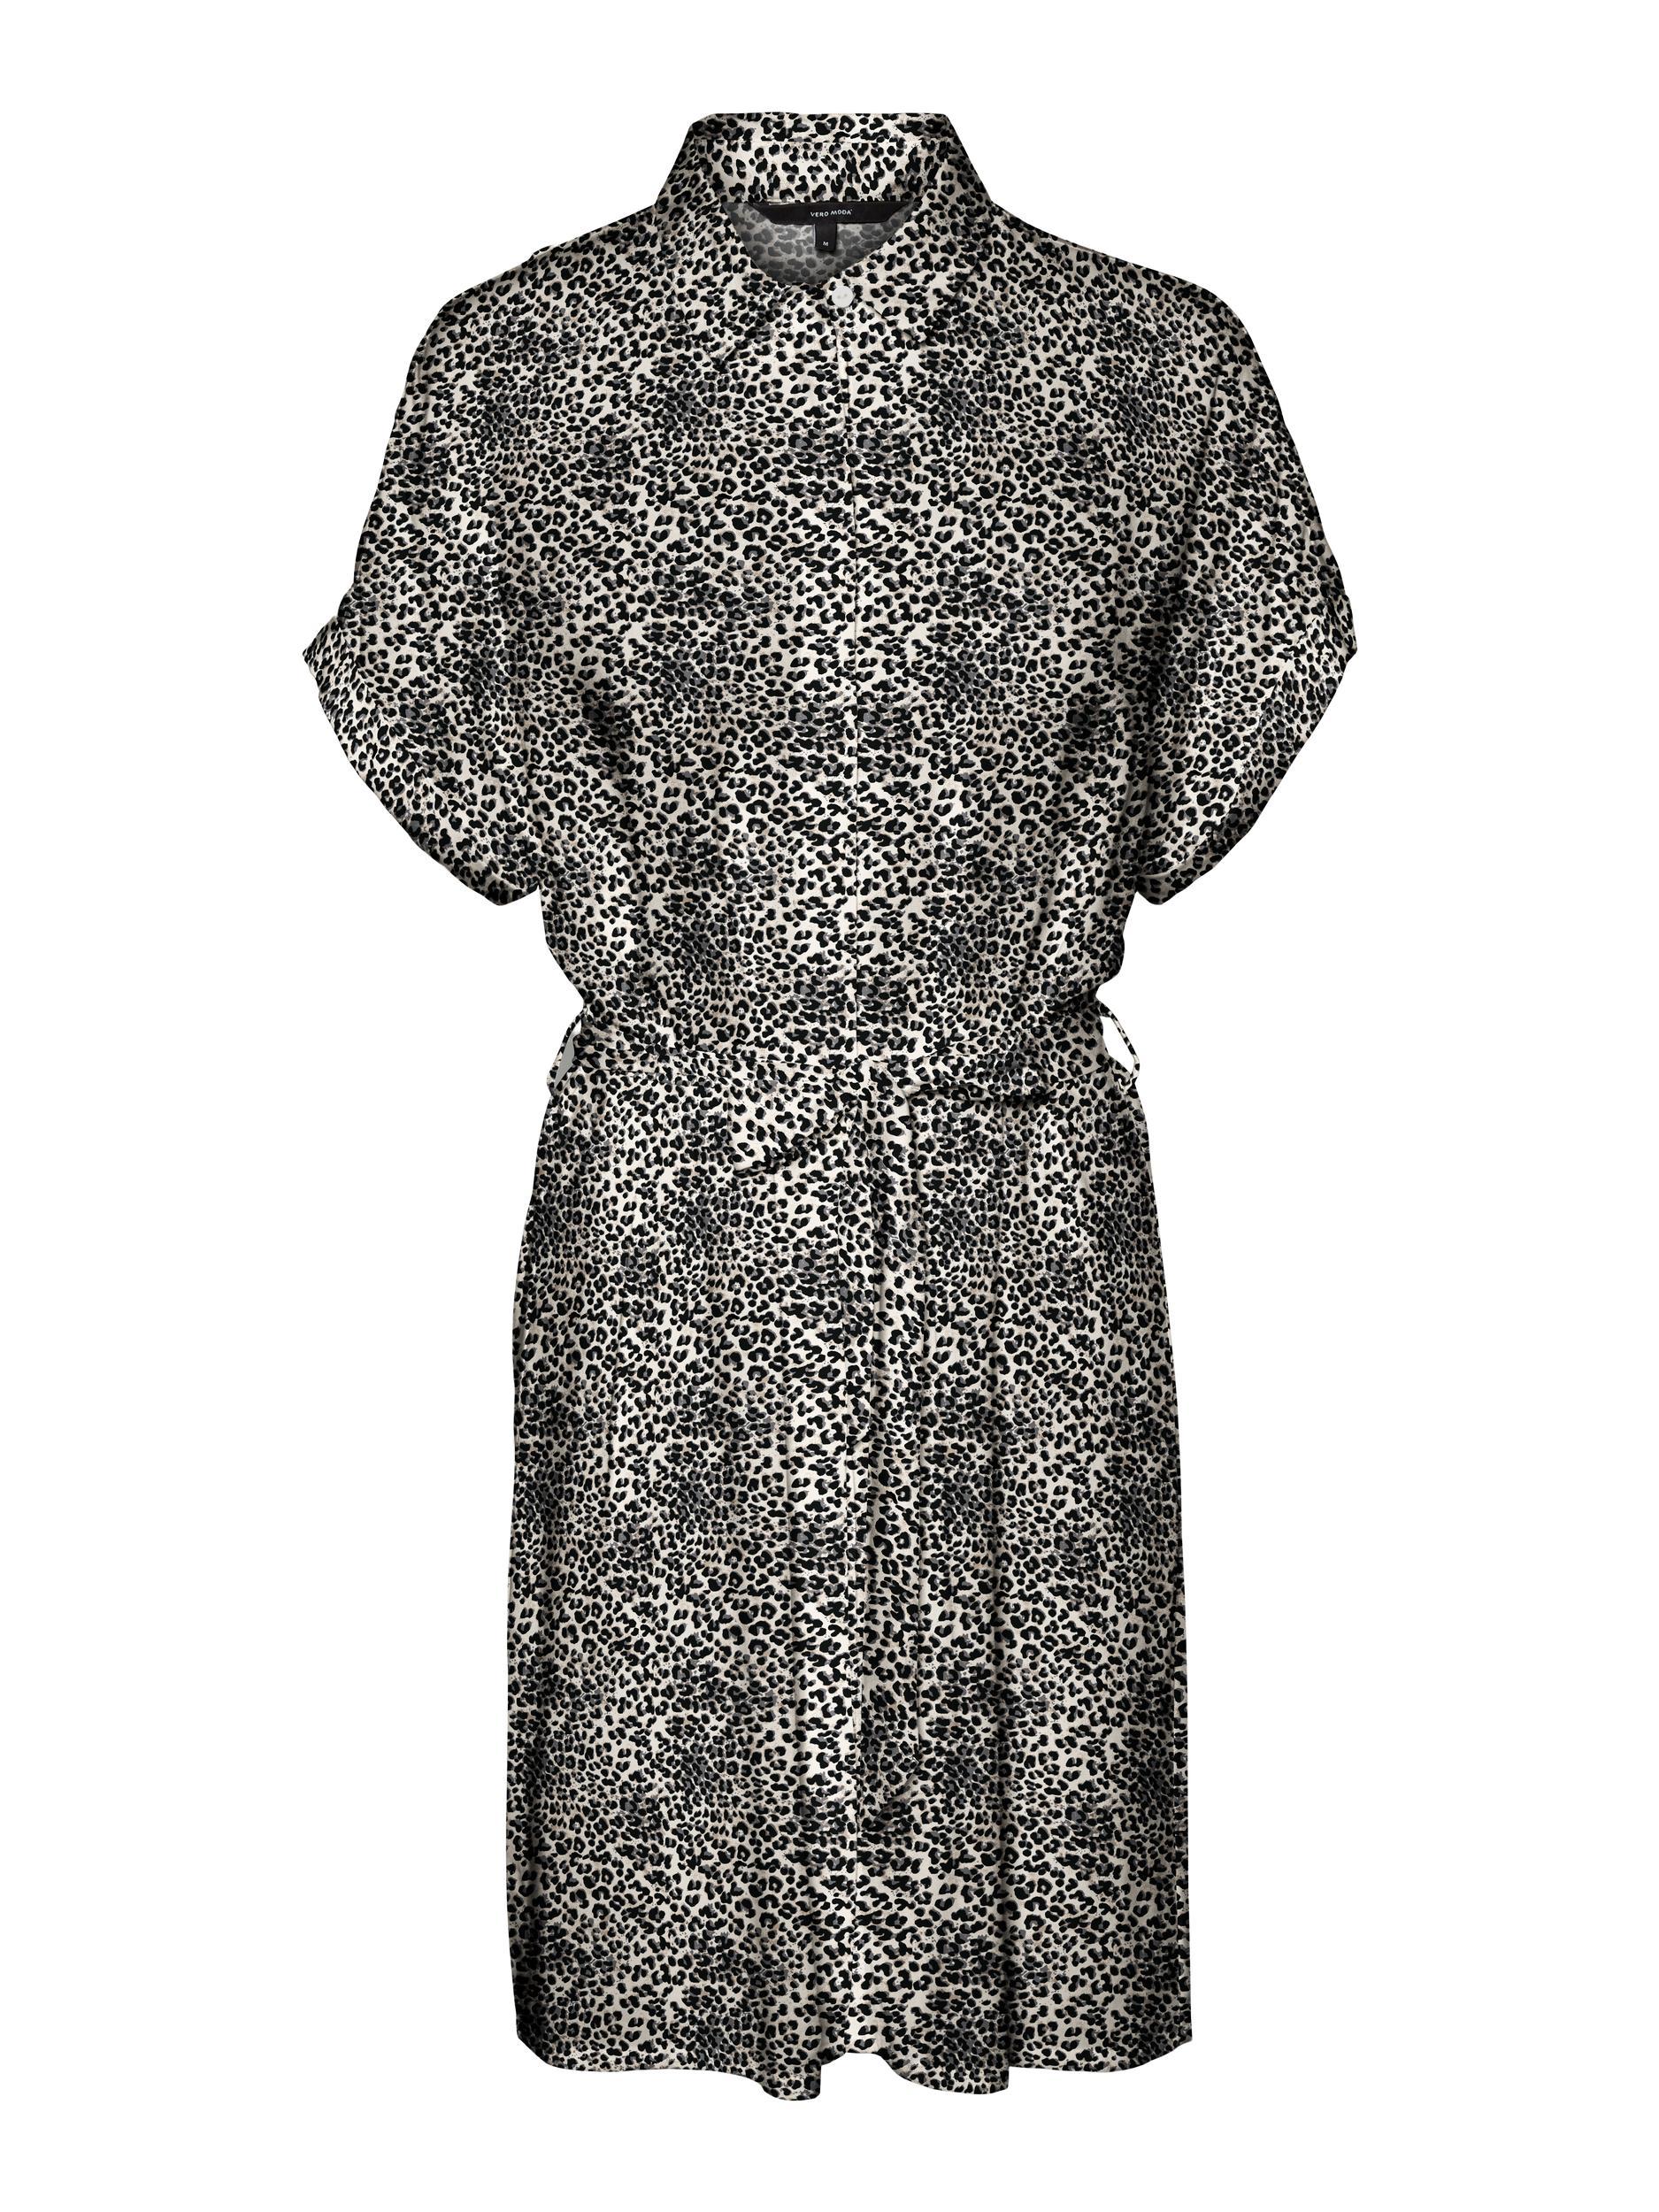 Vero Moda Simply Easy kjole, birch, large